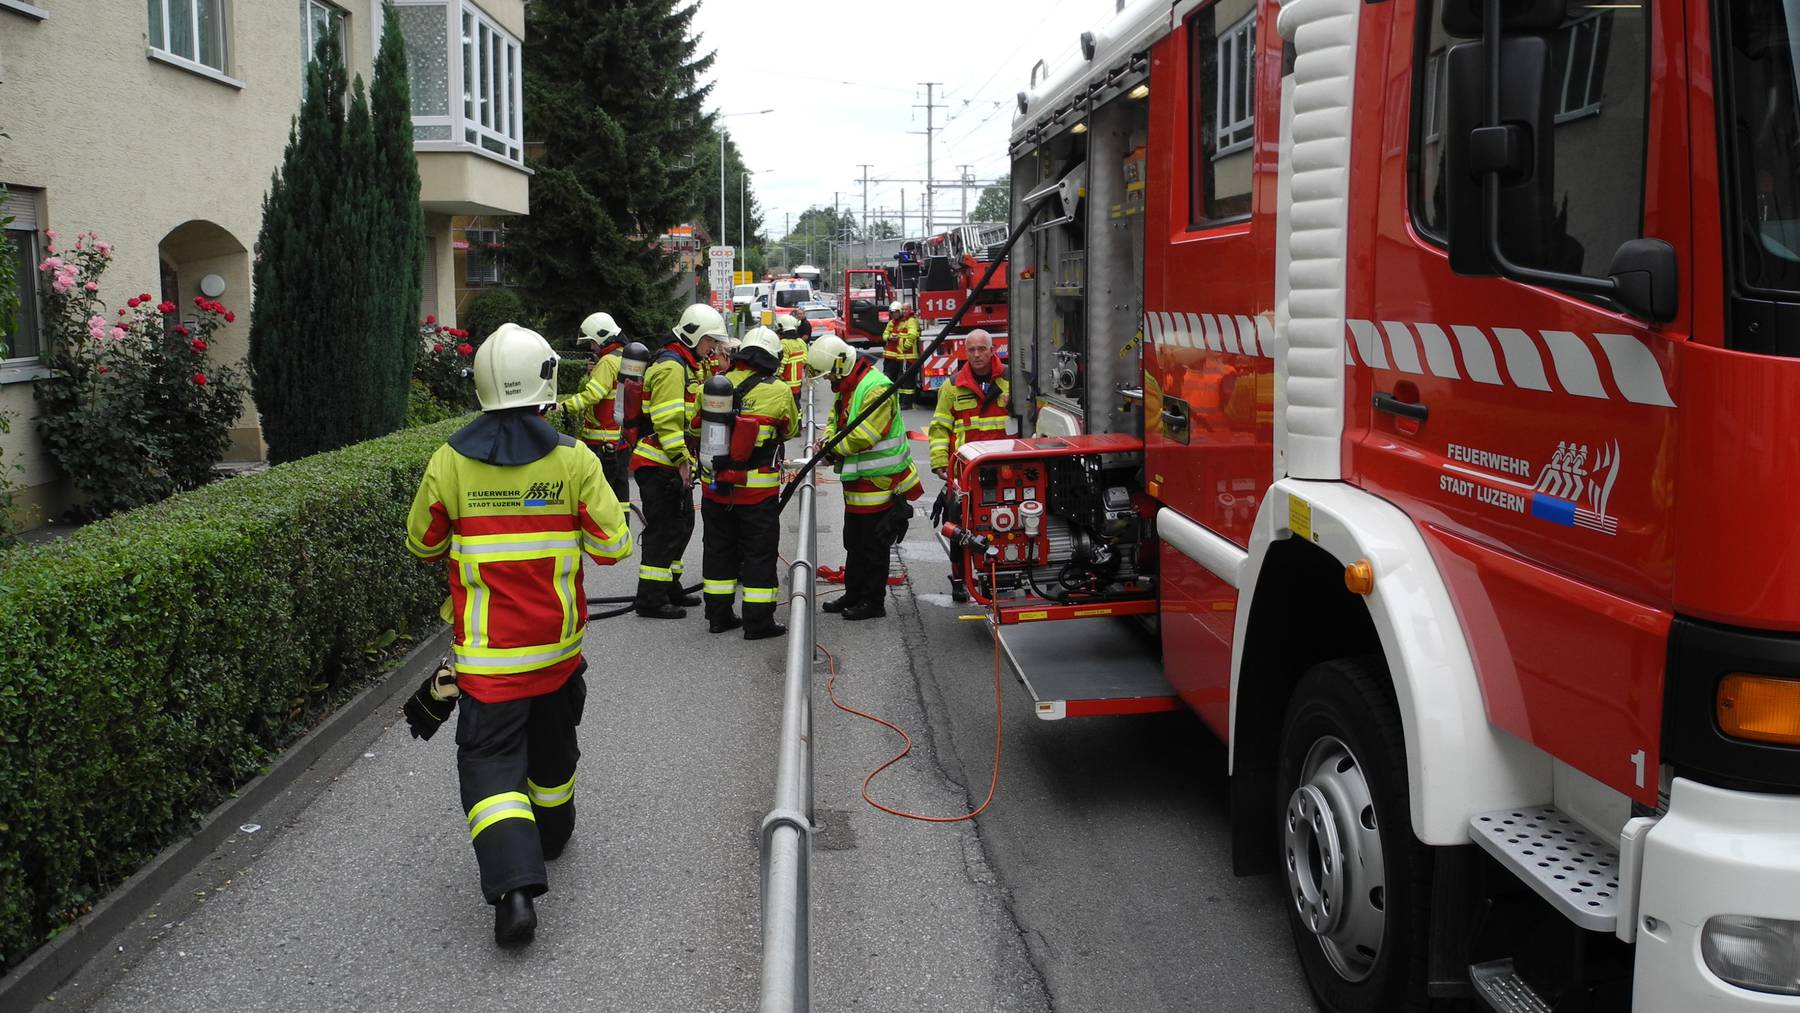 Elf Personen wegen Küchenbrand evakuiert